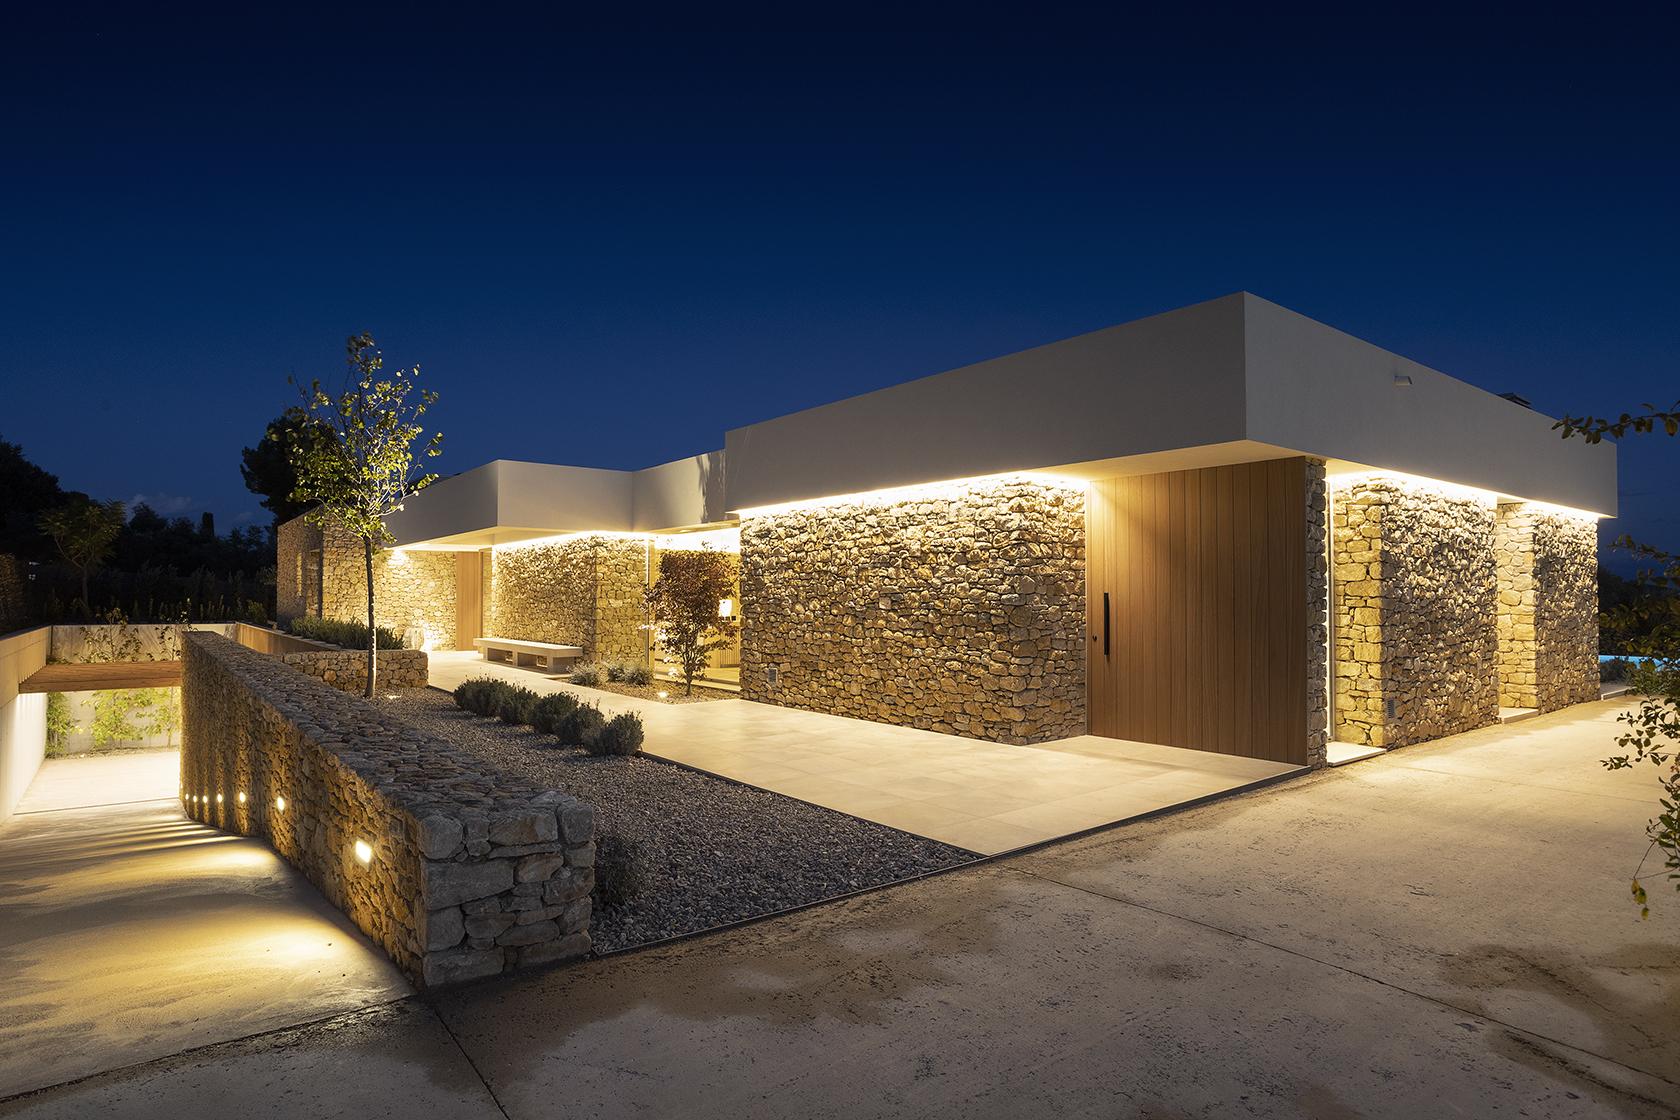 2020 - House in Costa Brava